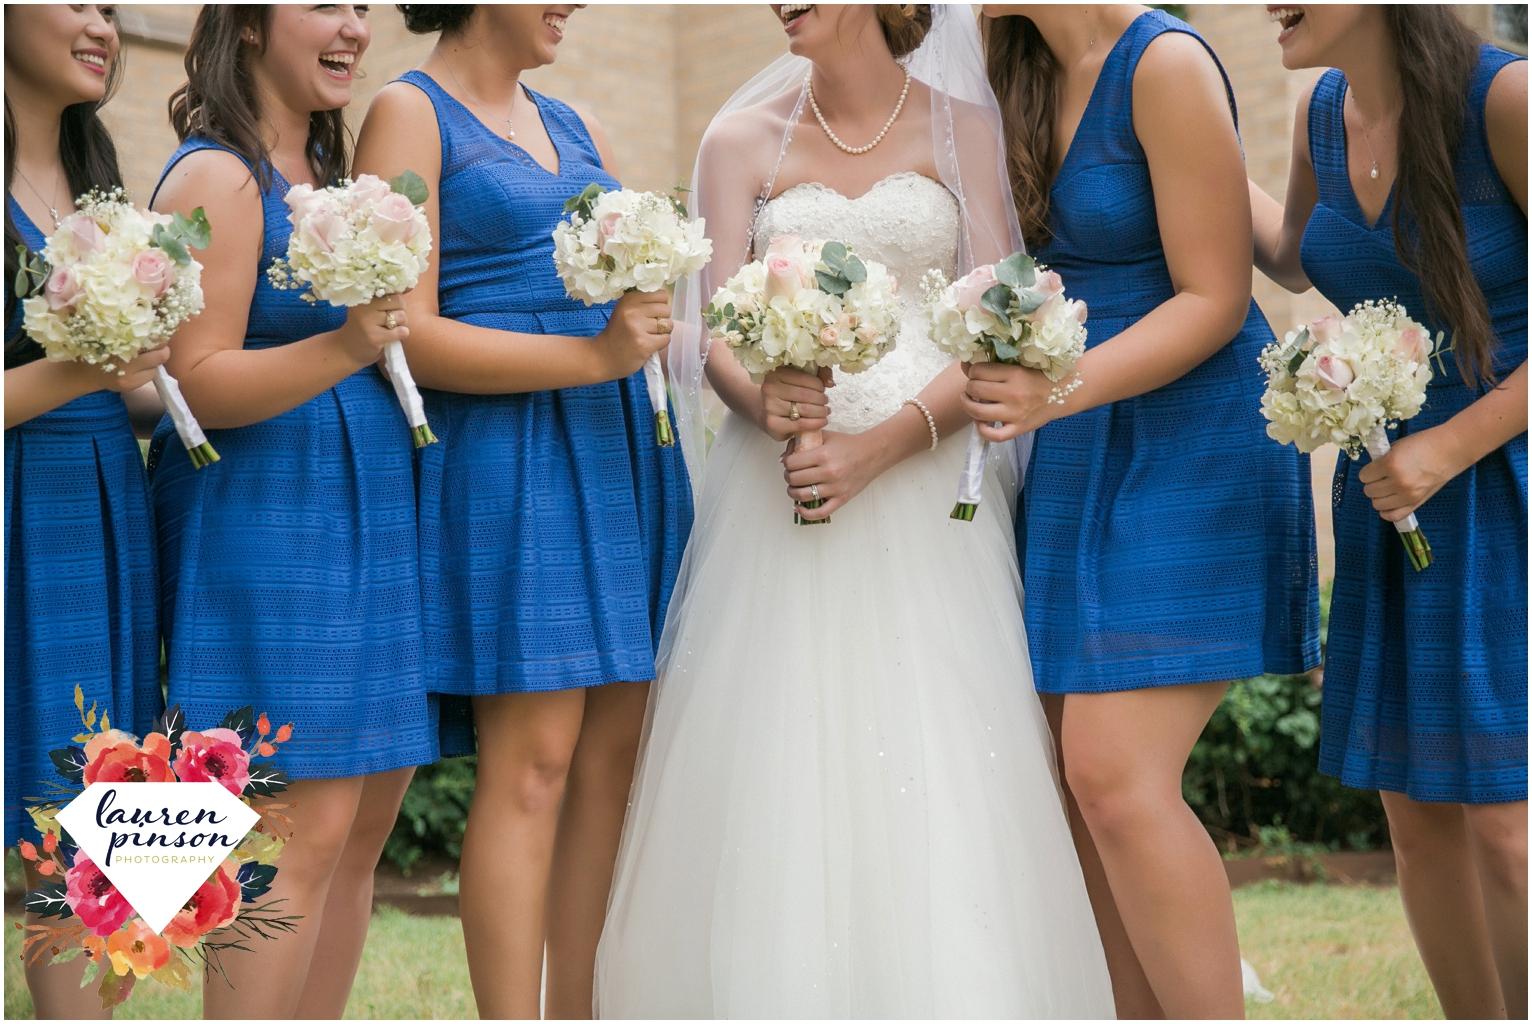 wichita-falls-wedding-photography-at-fain-presbyterian-church-and-the-wellington-timeless-classic-modern-photographer_1158.jpg